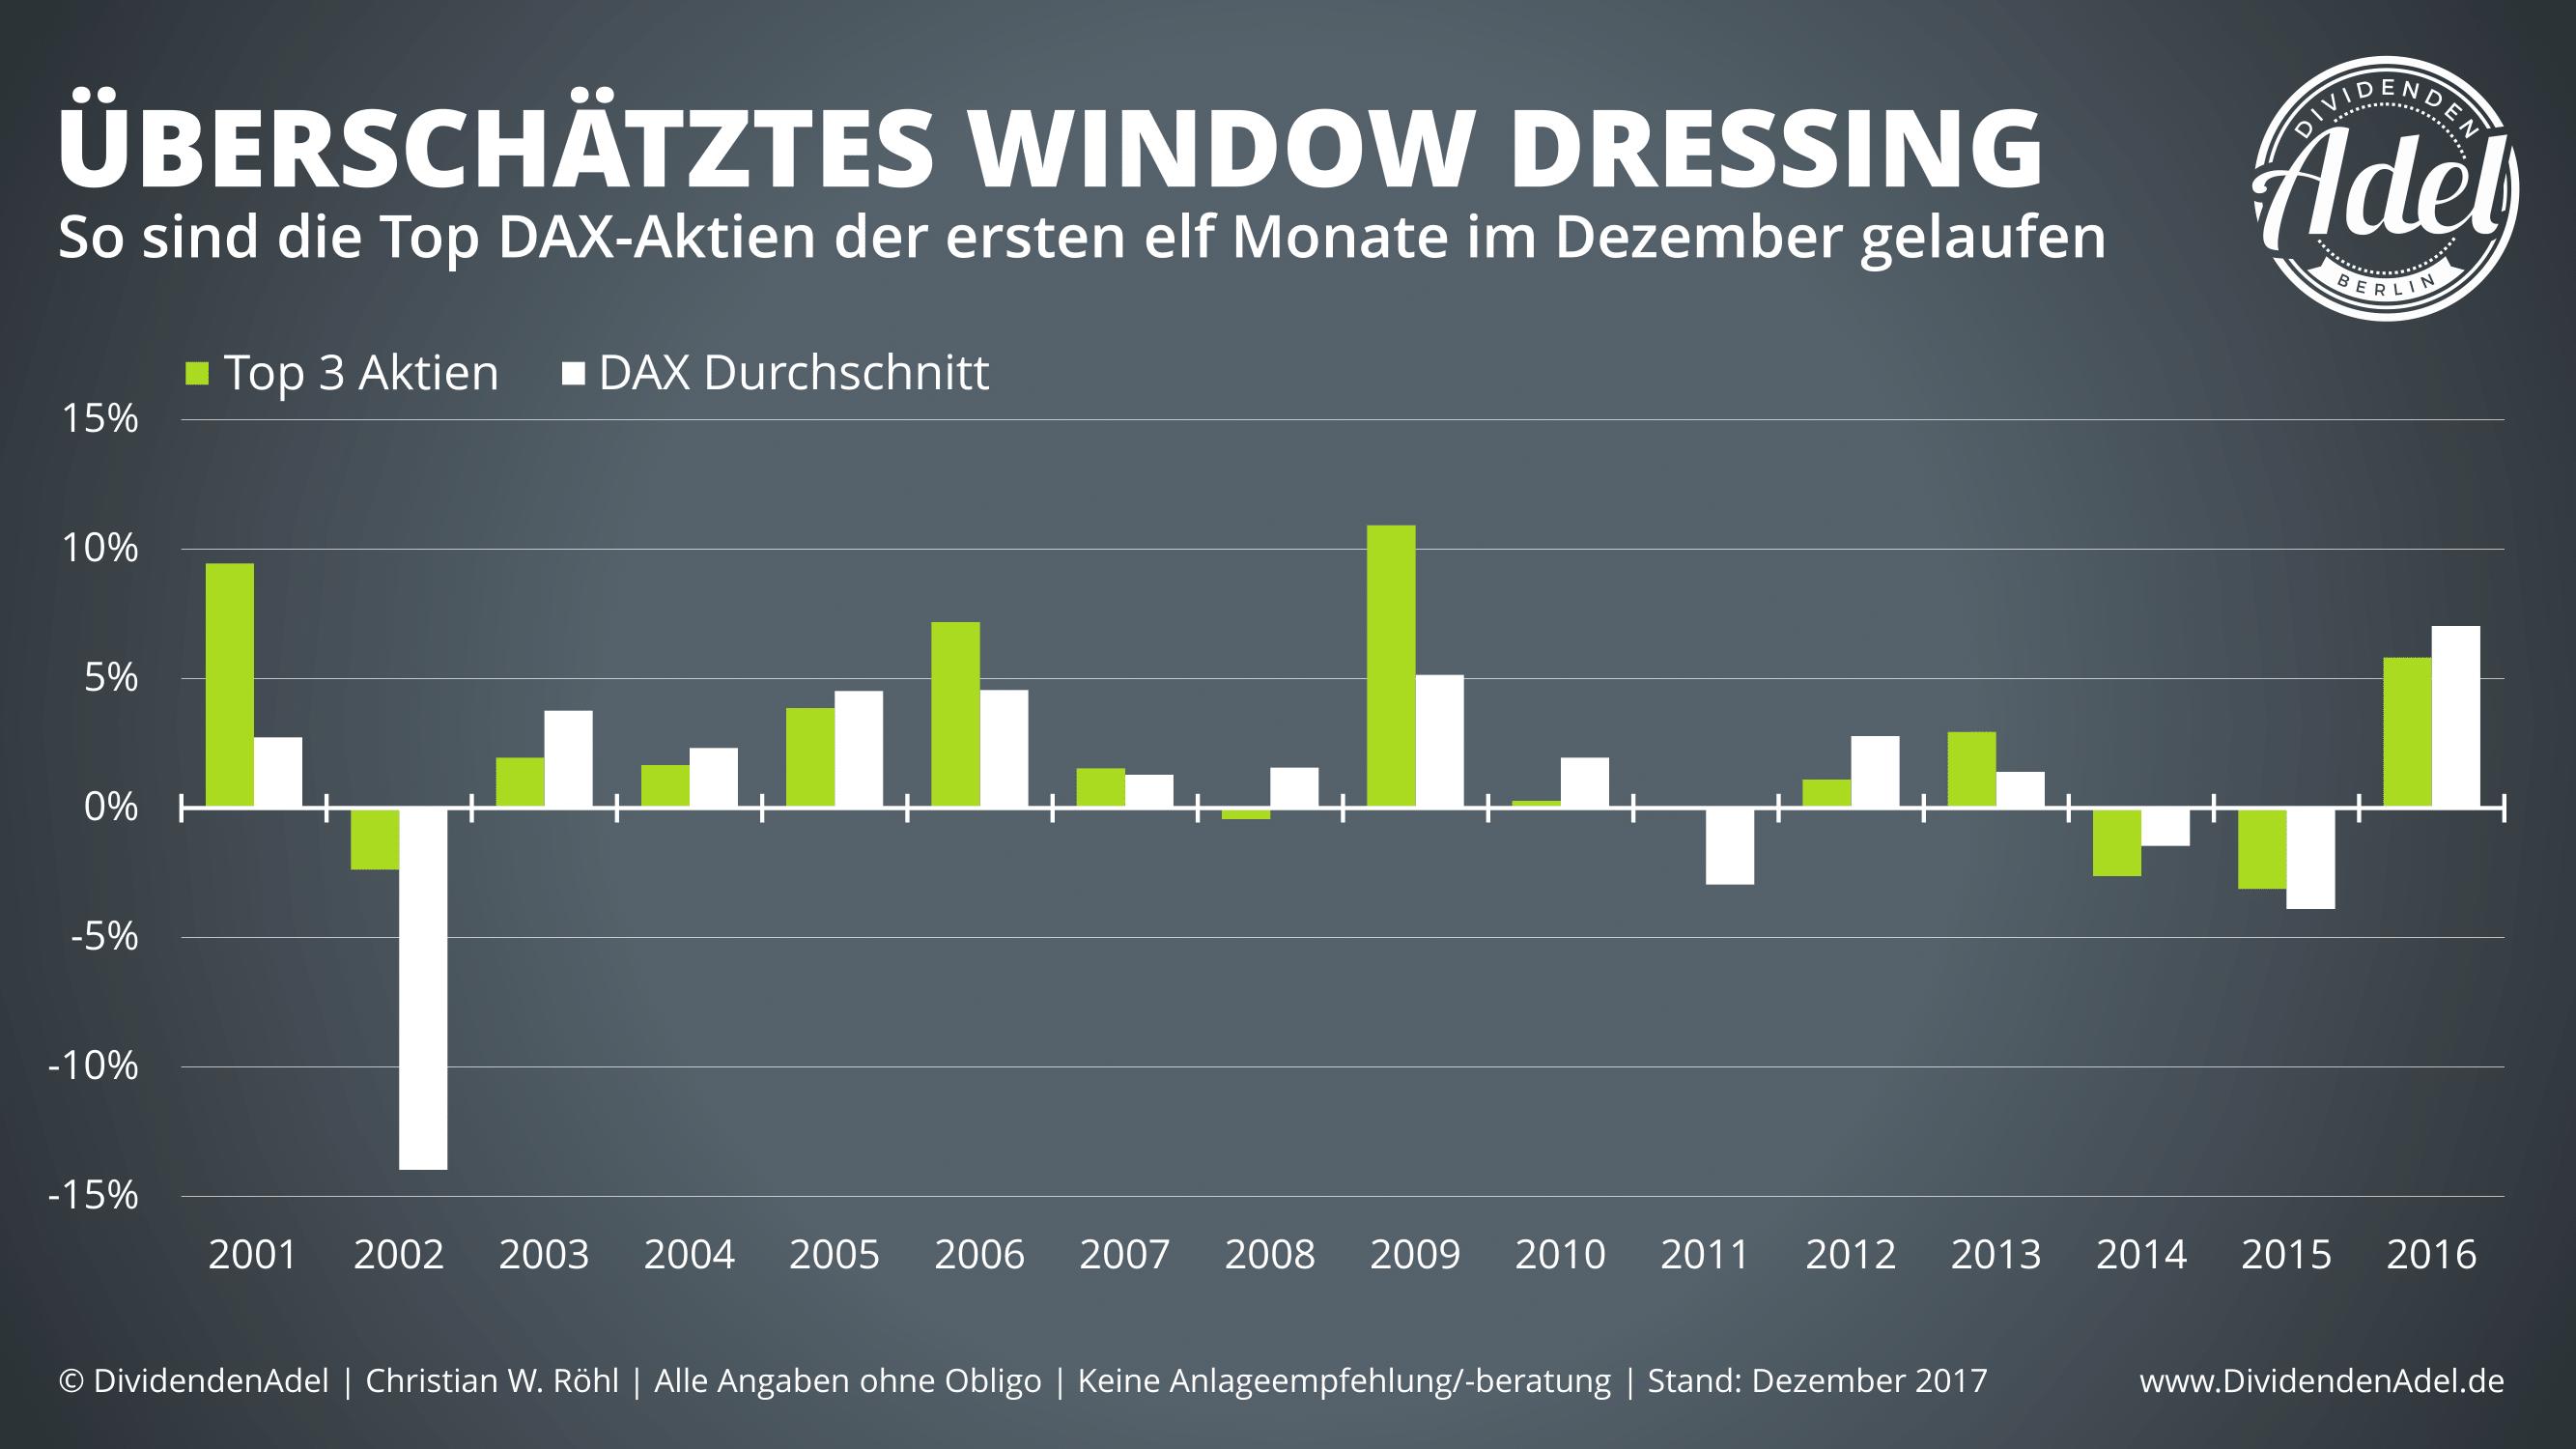 Window-Dressing-DAX-Top-3